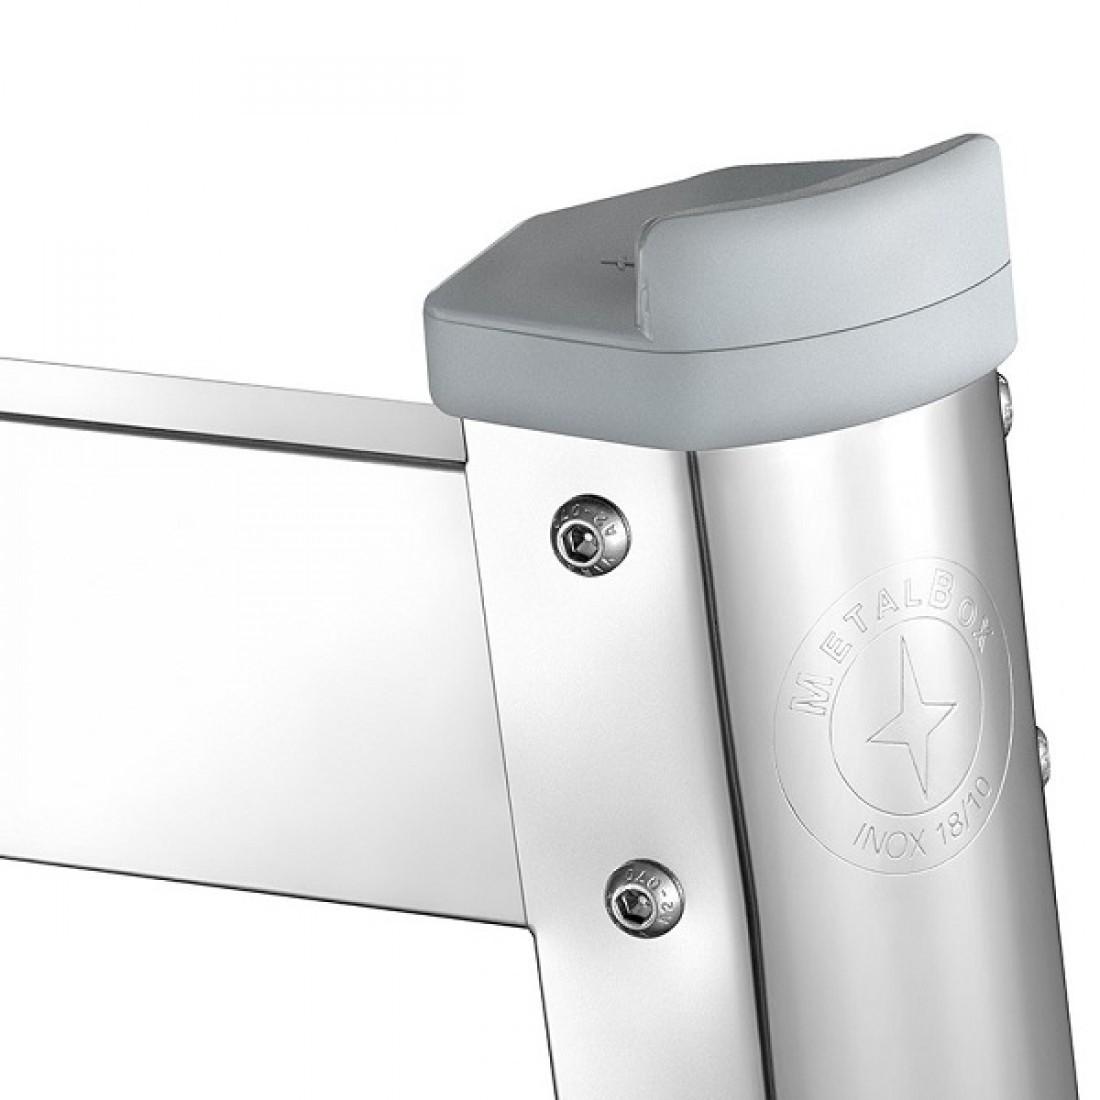 Trepied inox cu protectii din plastic MetalBox SB-38, 380 mm